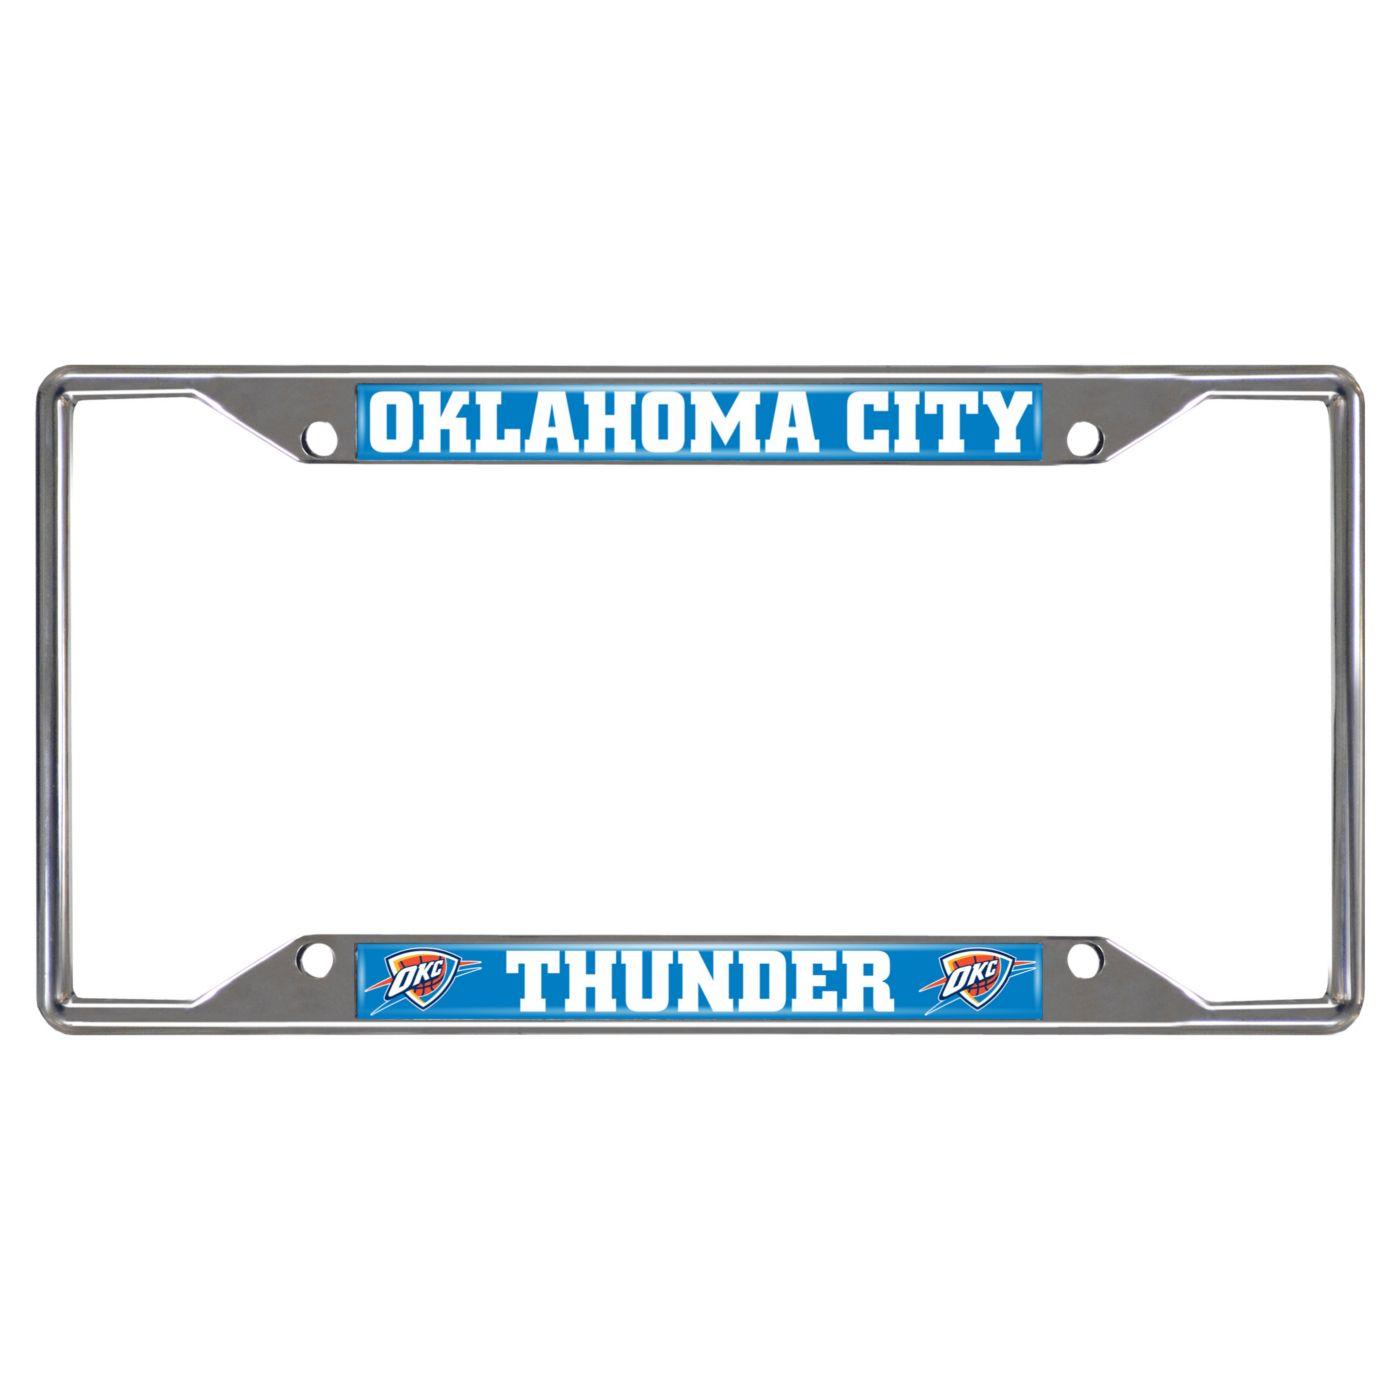 FANMATS Oklahoma City Thunder License Plate Frame